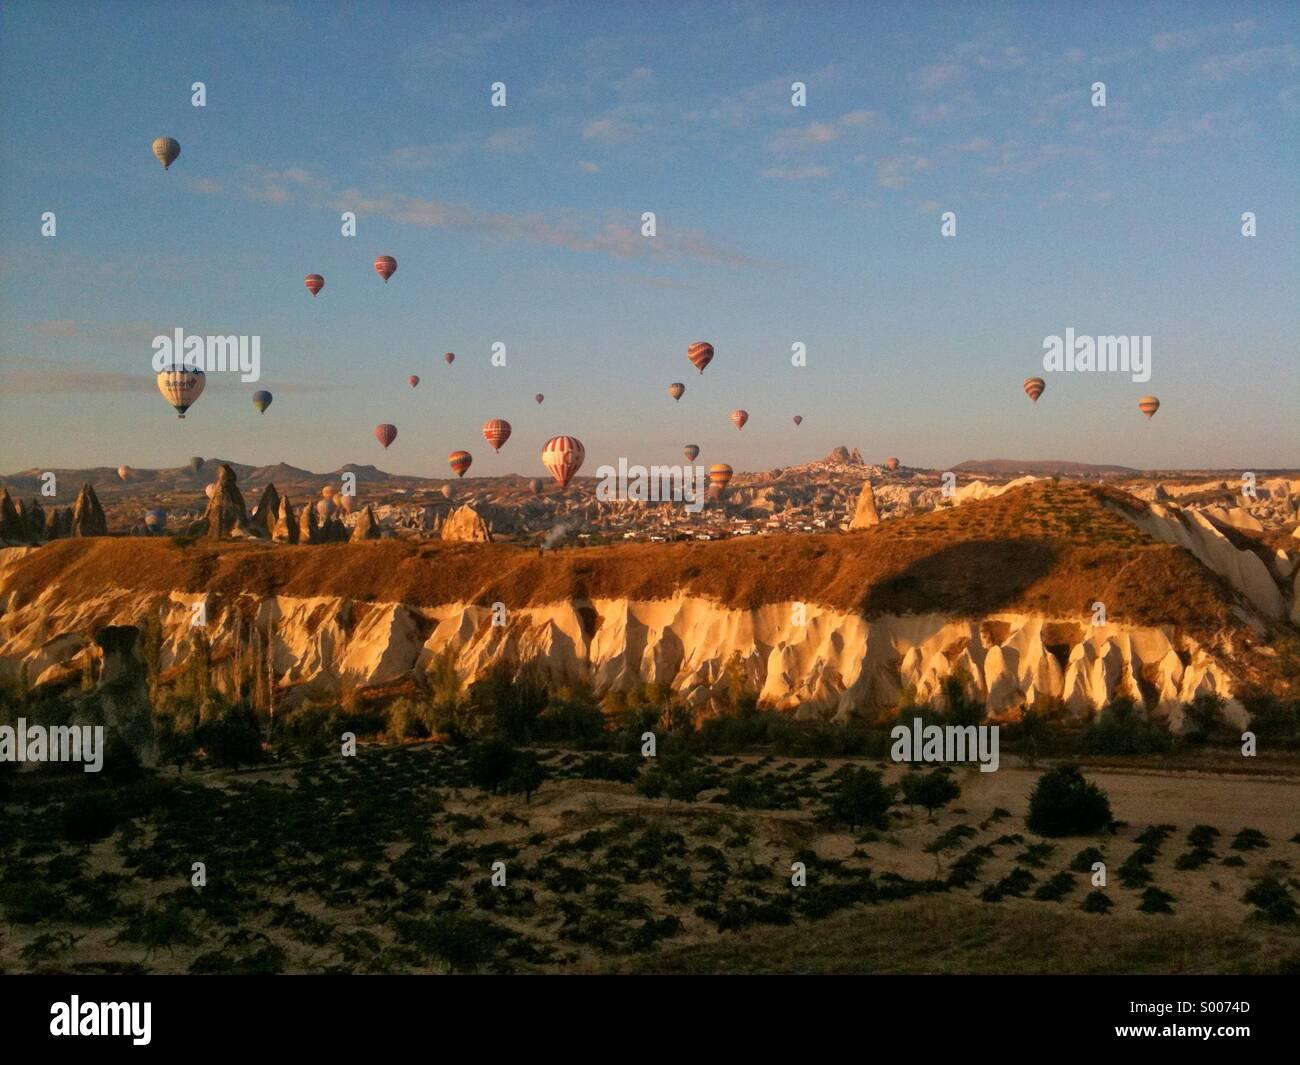 Hot air balloons over Goreme in Cappadocia, central turkey. - Stock Image